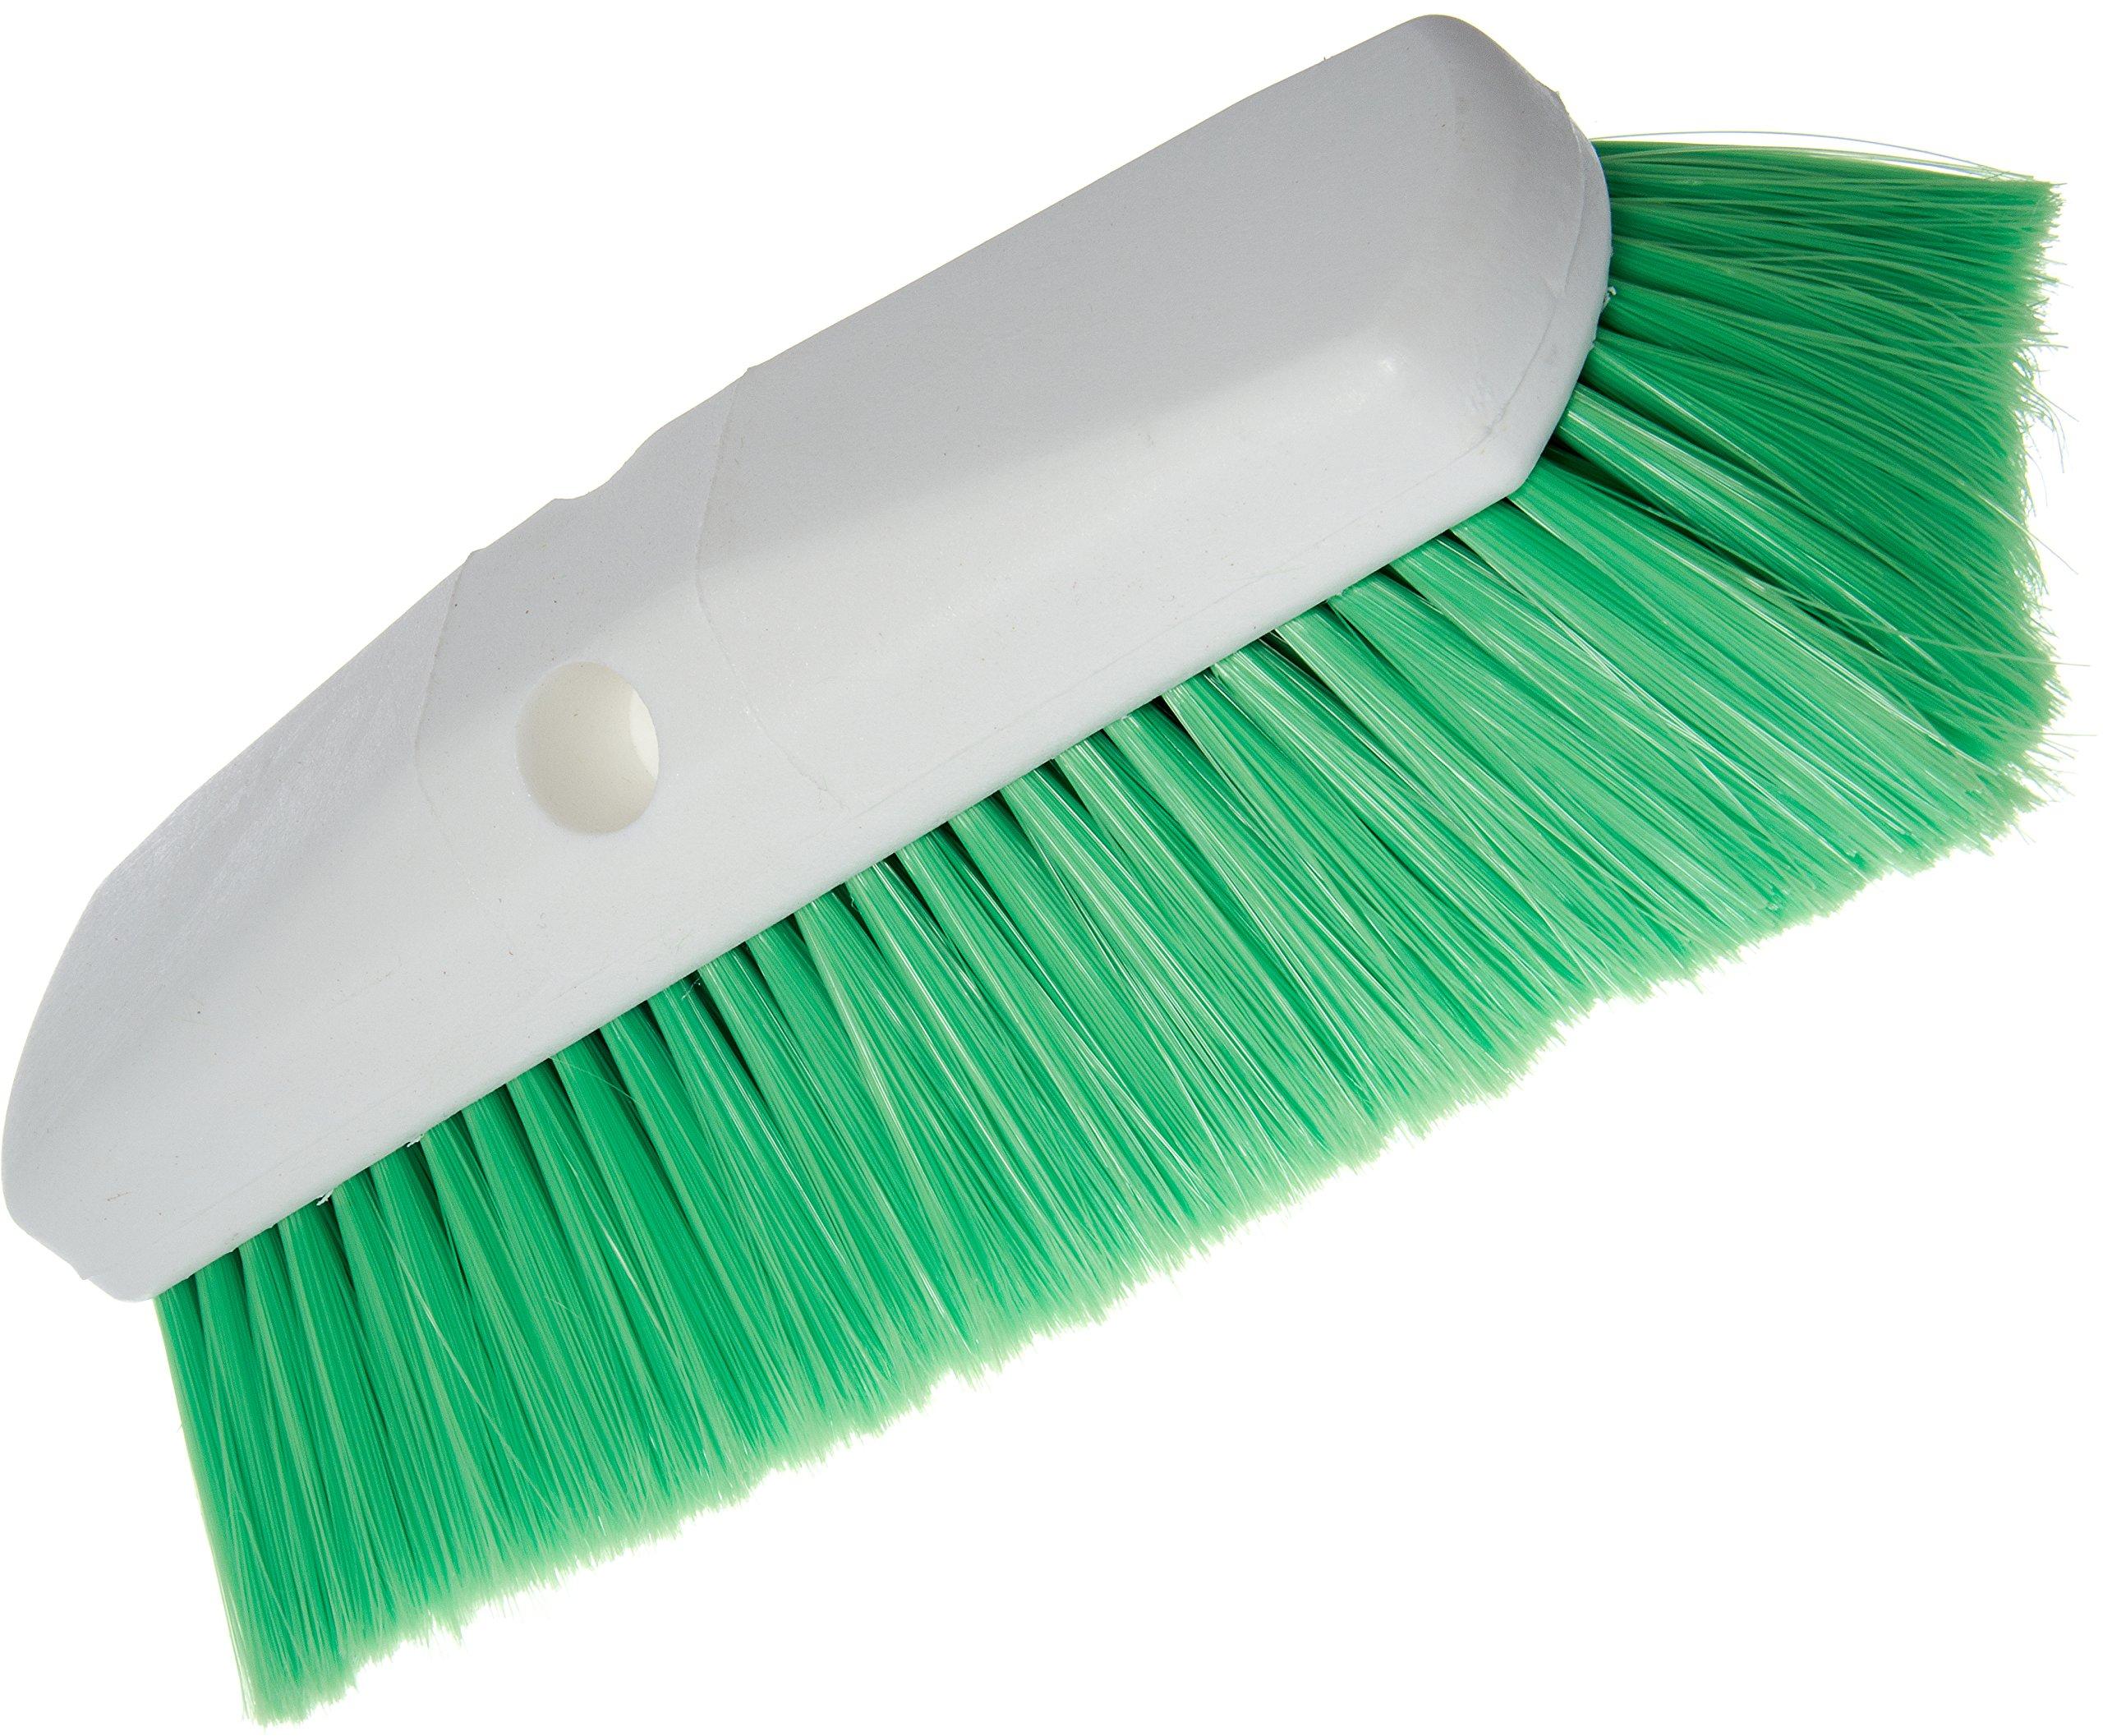 Carlisle 4127875 Sparta Spectrum Flo-Pac Flo-Thru Wall & Equipment Brush, Plastic Block, 2-1/2''-Long Green Flagged Nylex Bristles, 10'' L x 2-1/2'' W (Case of 12)